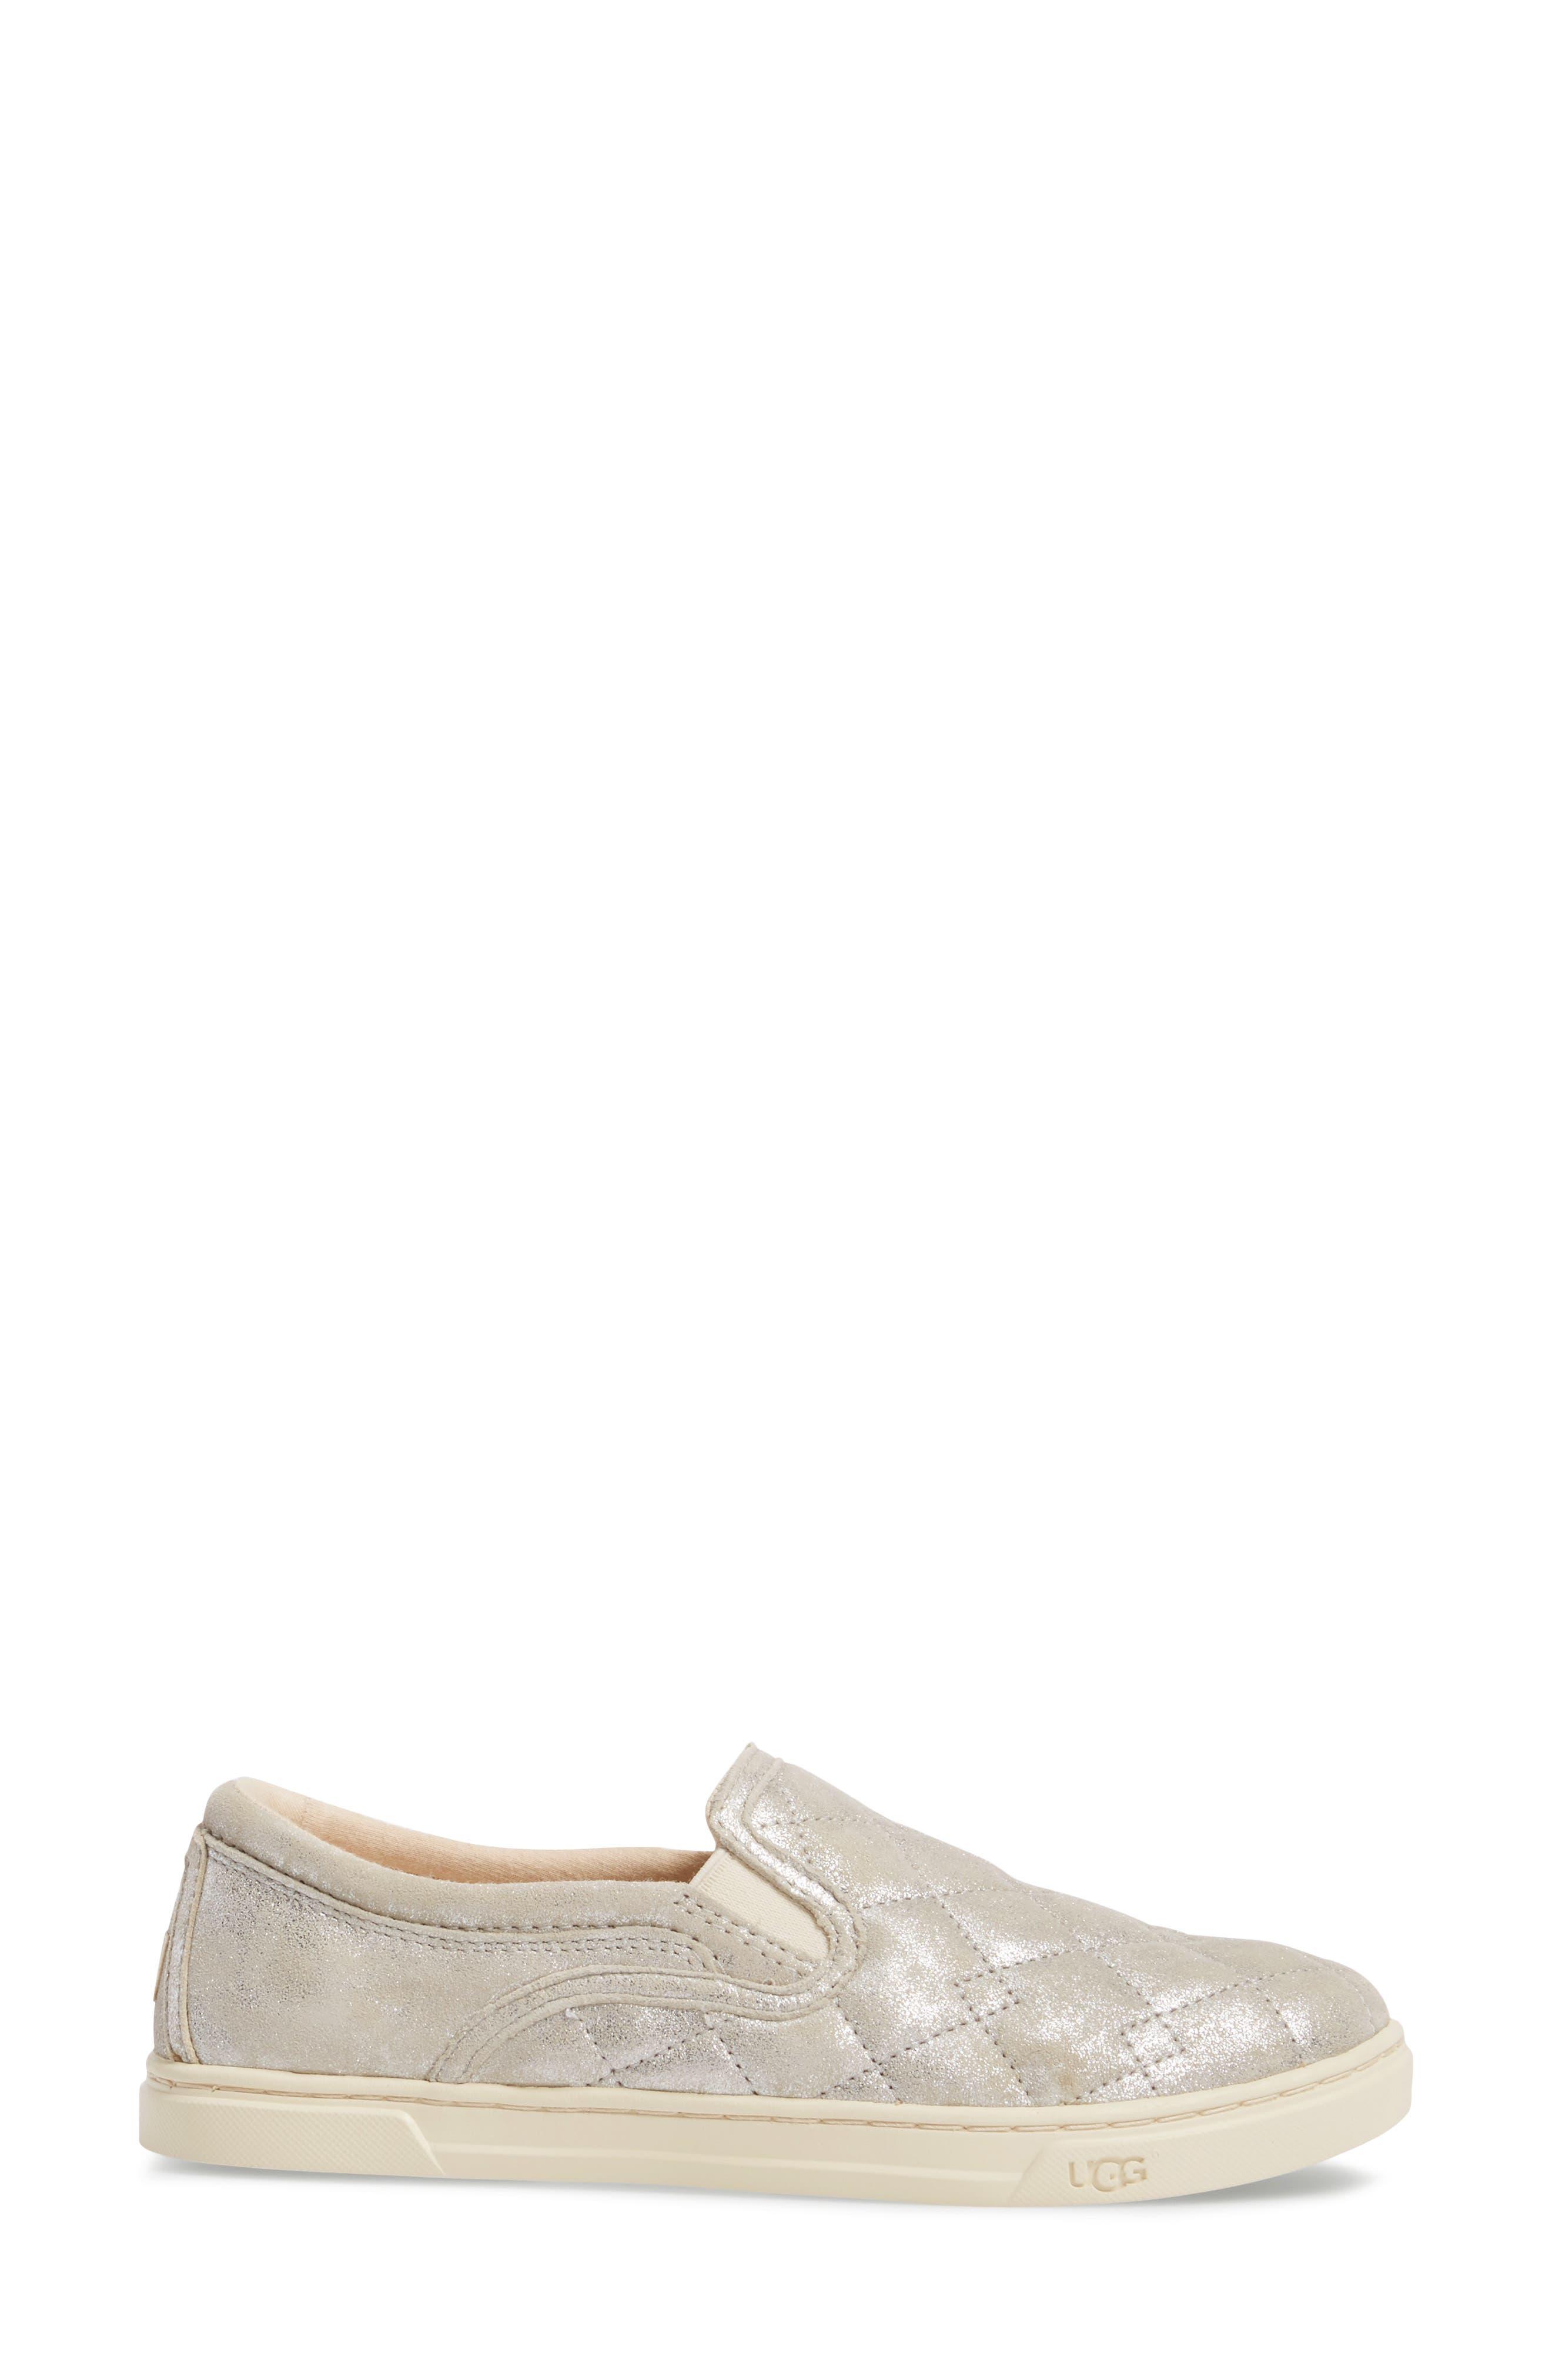 Alternate Image 3  - UGG® Fierce Stardust Quilted Slip-On Sneaker (Women)